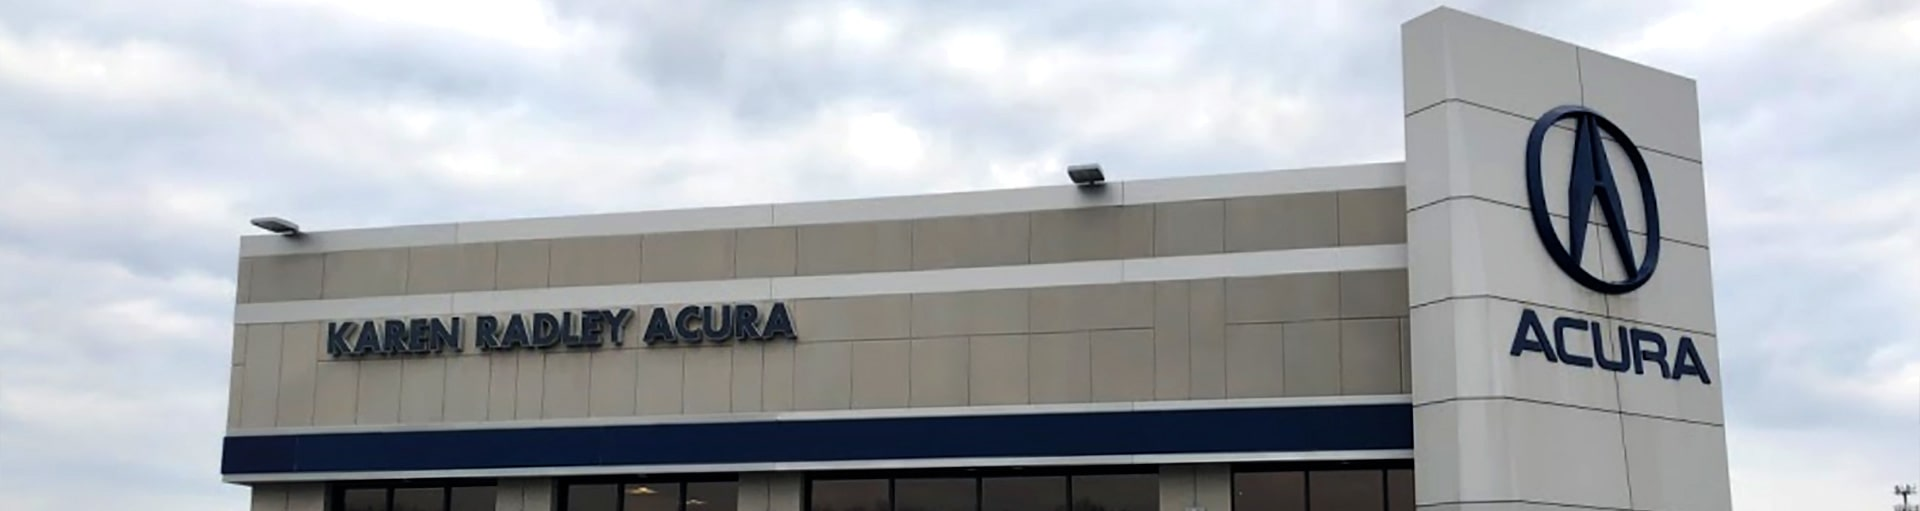 Karen Radley Acura Service Specials